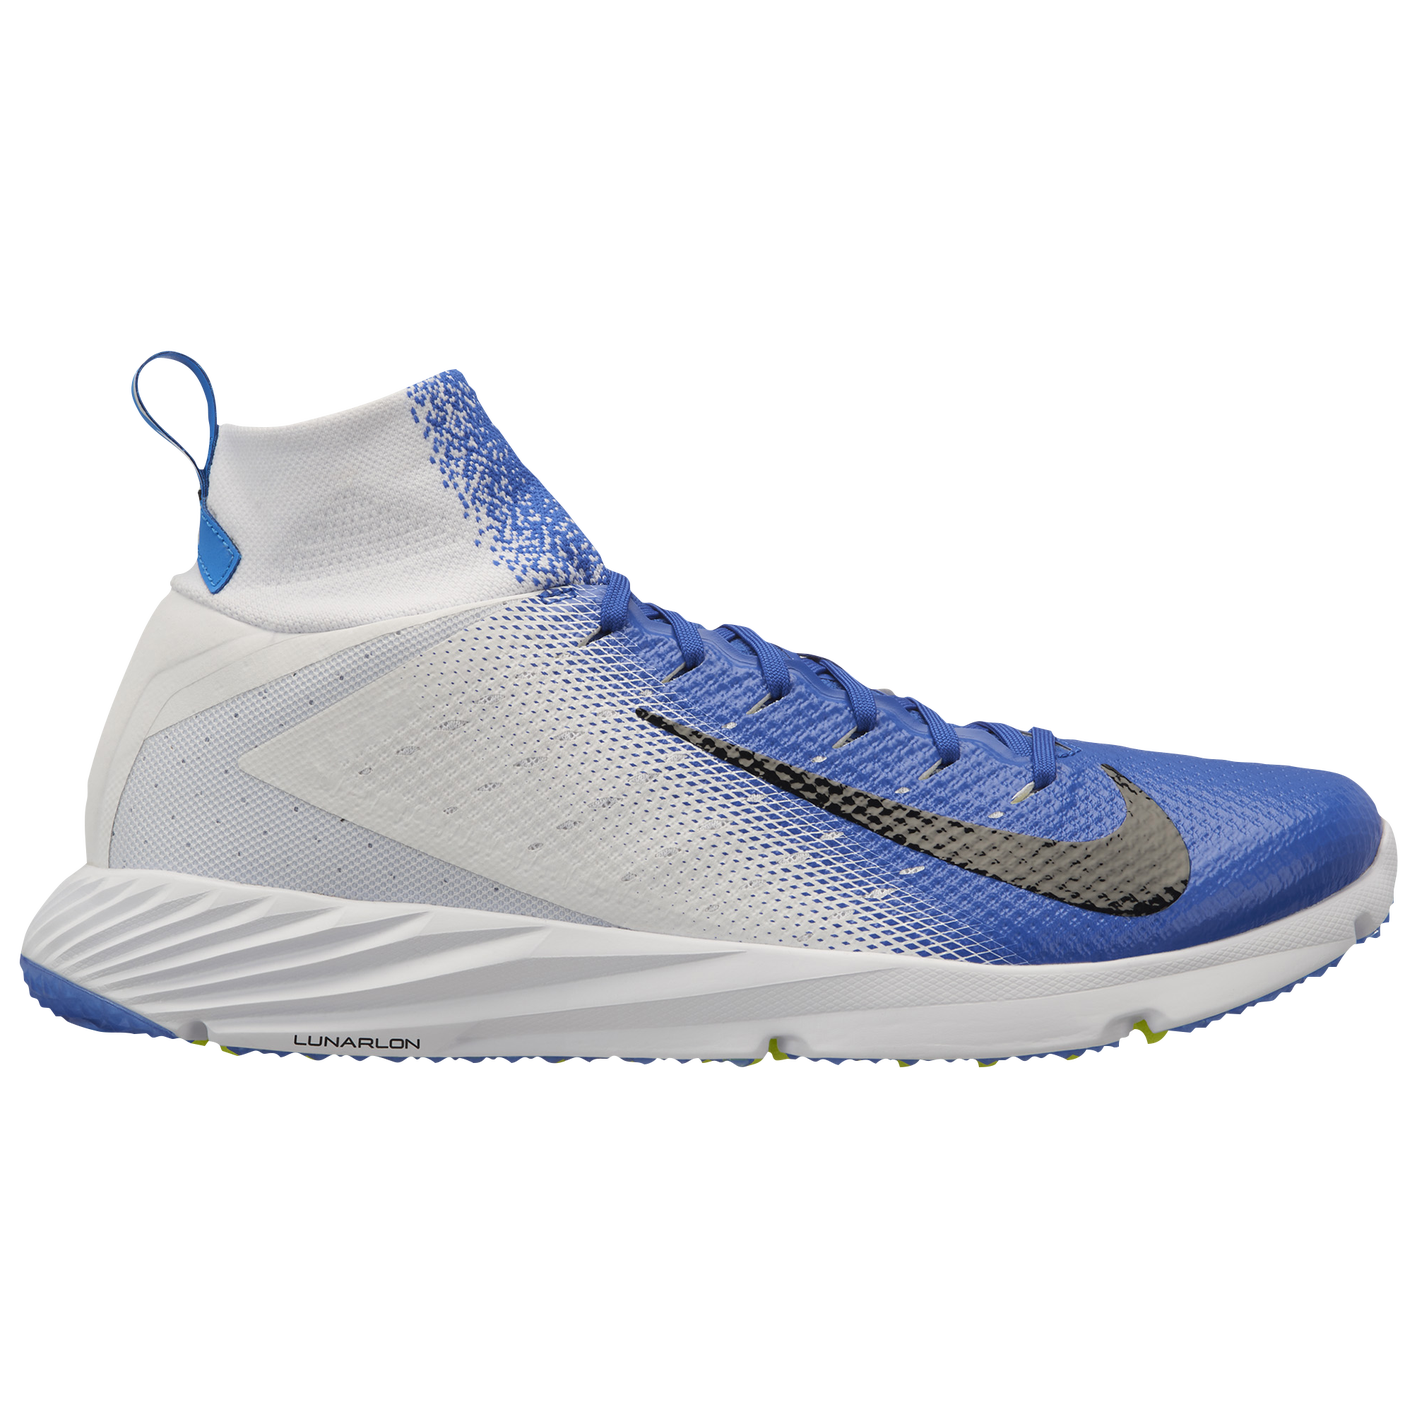 9707f25c357 Nike Vapor Untouchable Speed Turf 2 - Men s - Football - Shoes ...